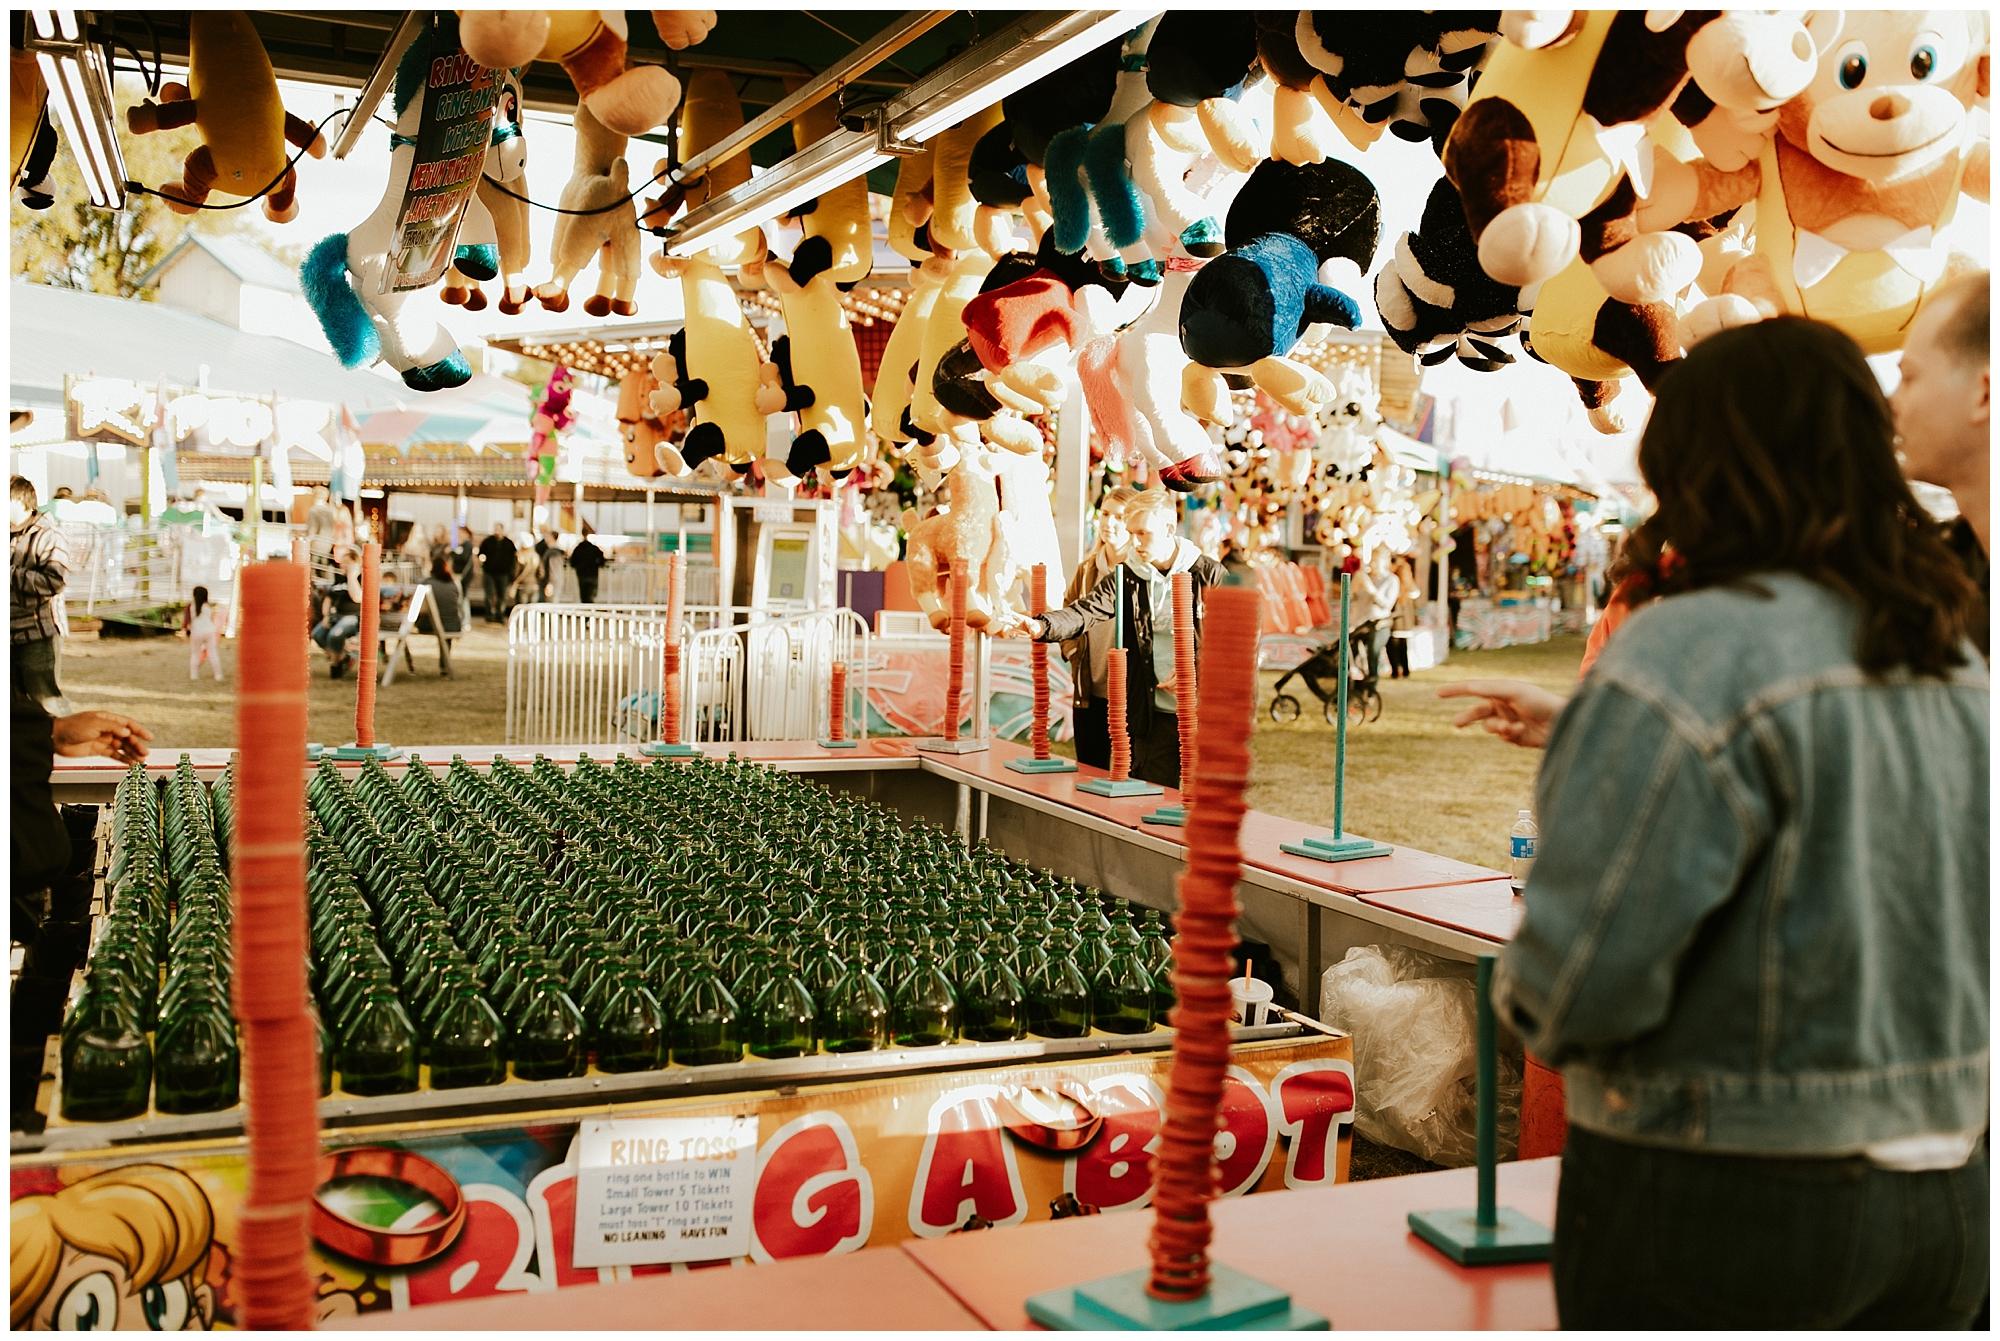 Spokane Interstate Fair Cassie Trottier Photo1027.jpg